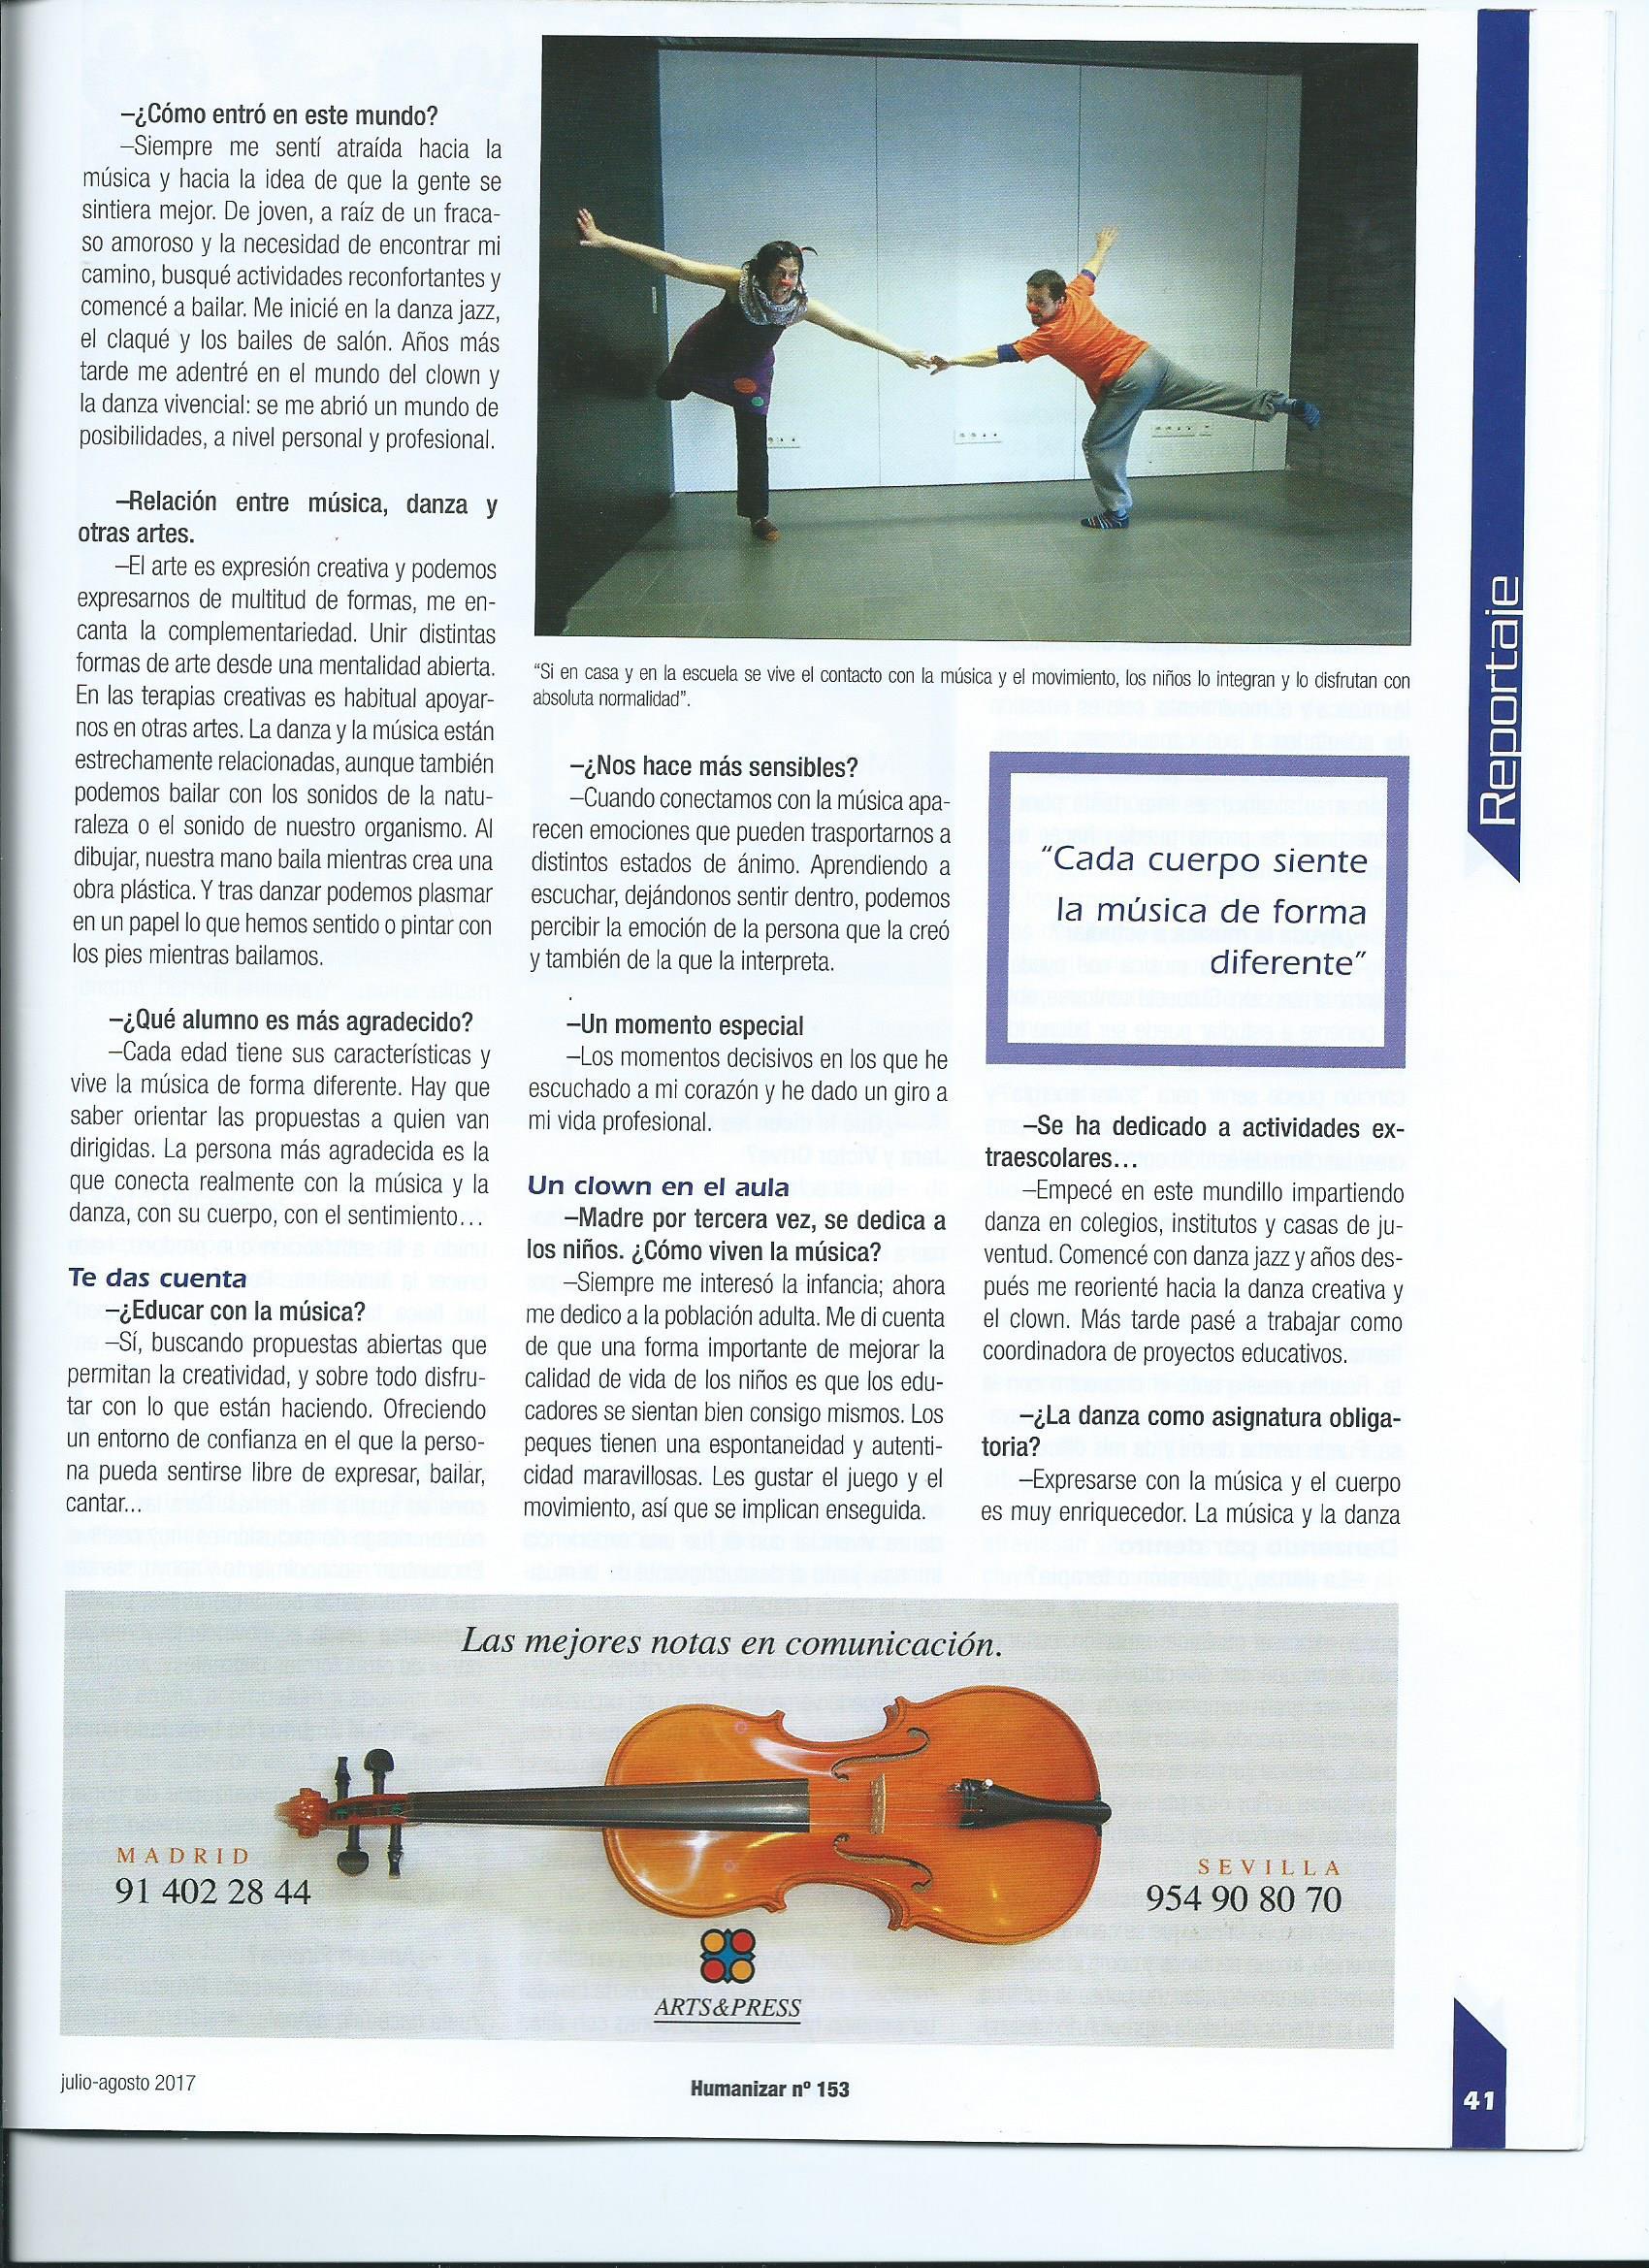 entrevista Anaís Isarre revista Humanizar 2